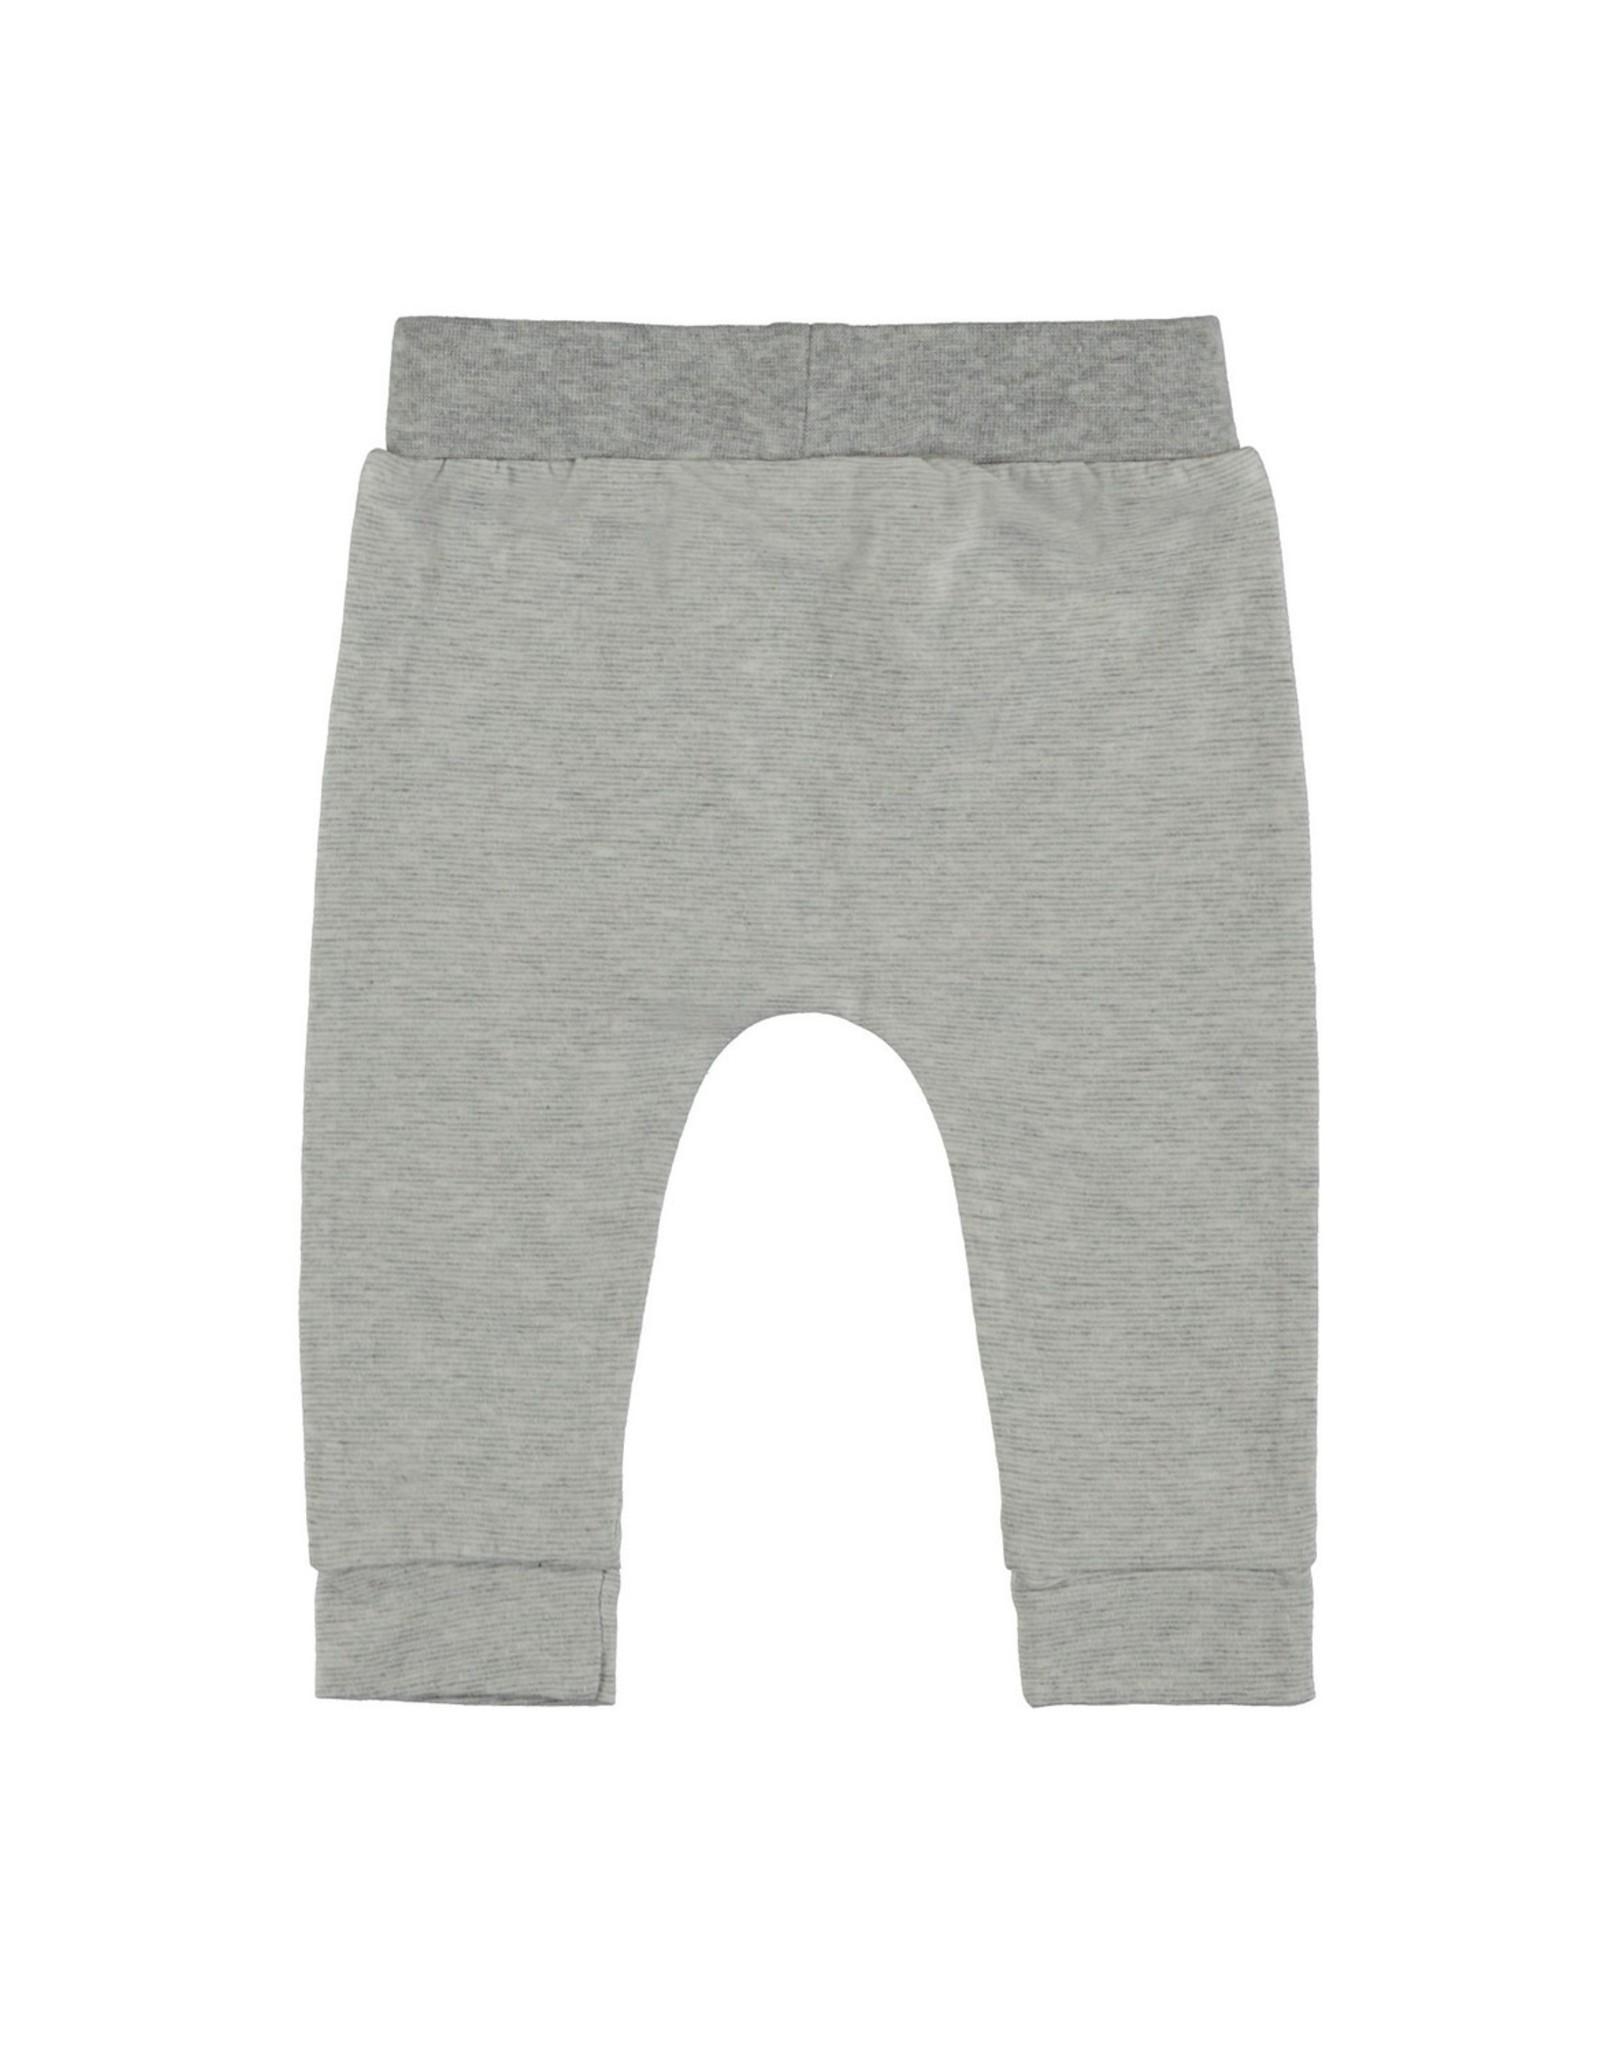 Bampidano New Born trousers melange y/d stripe, grey melee stripe